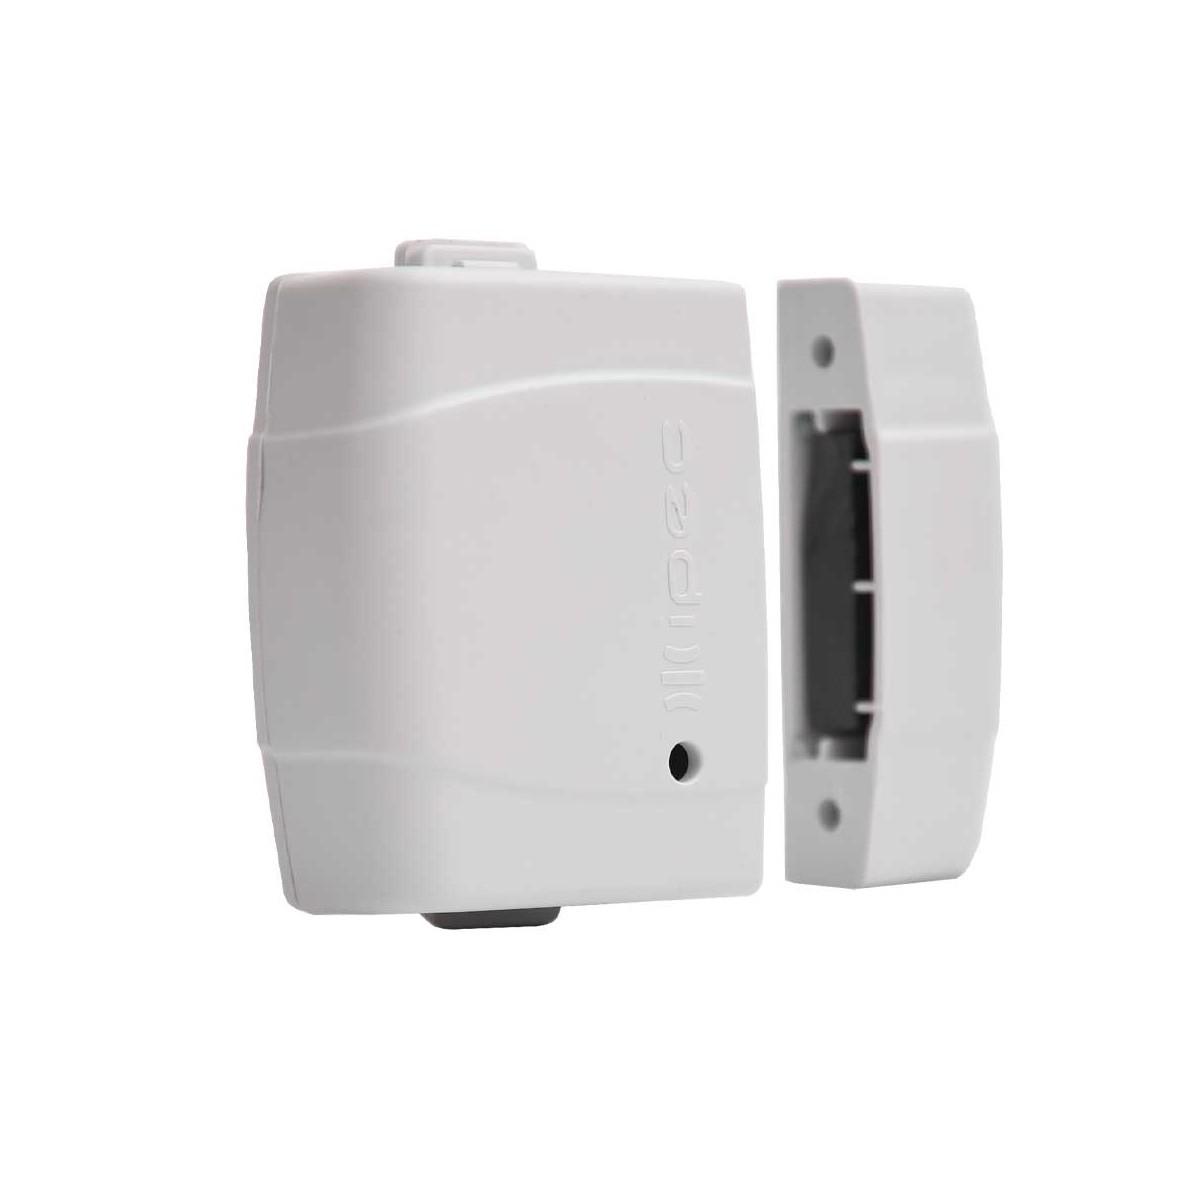 4pcs Sensor Magnético Sem Fio Alarme Residencial Portas Janelas Saw 433,92mhz Ipec